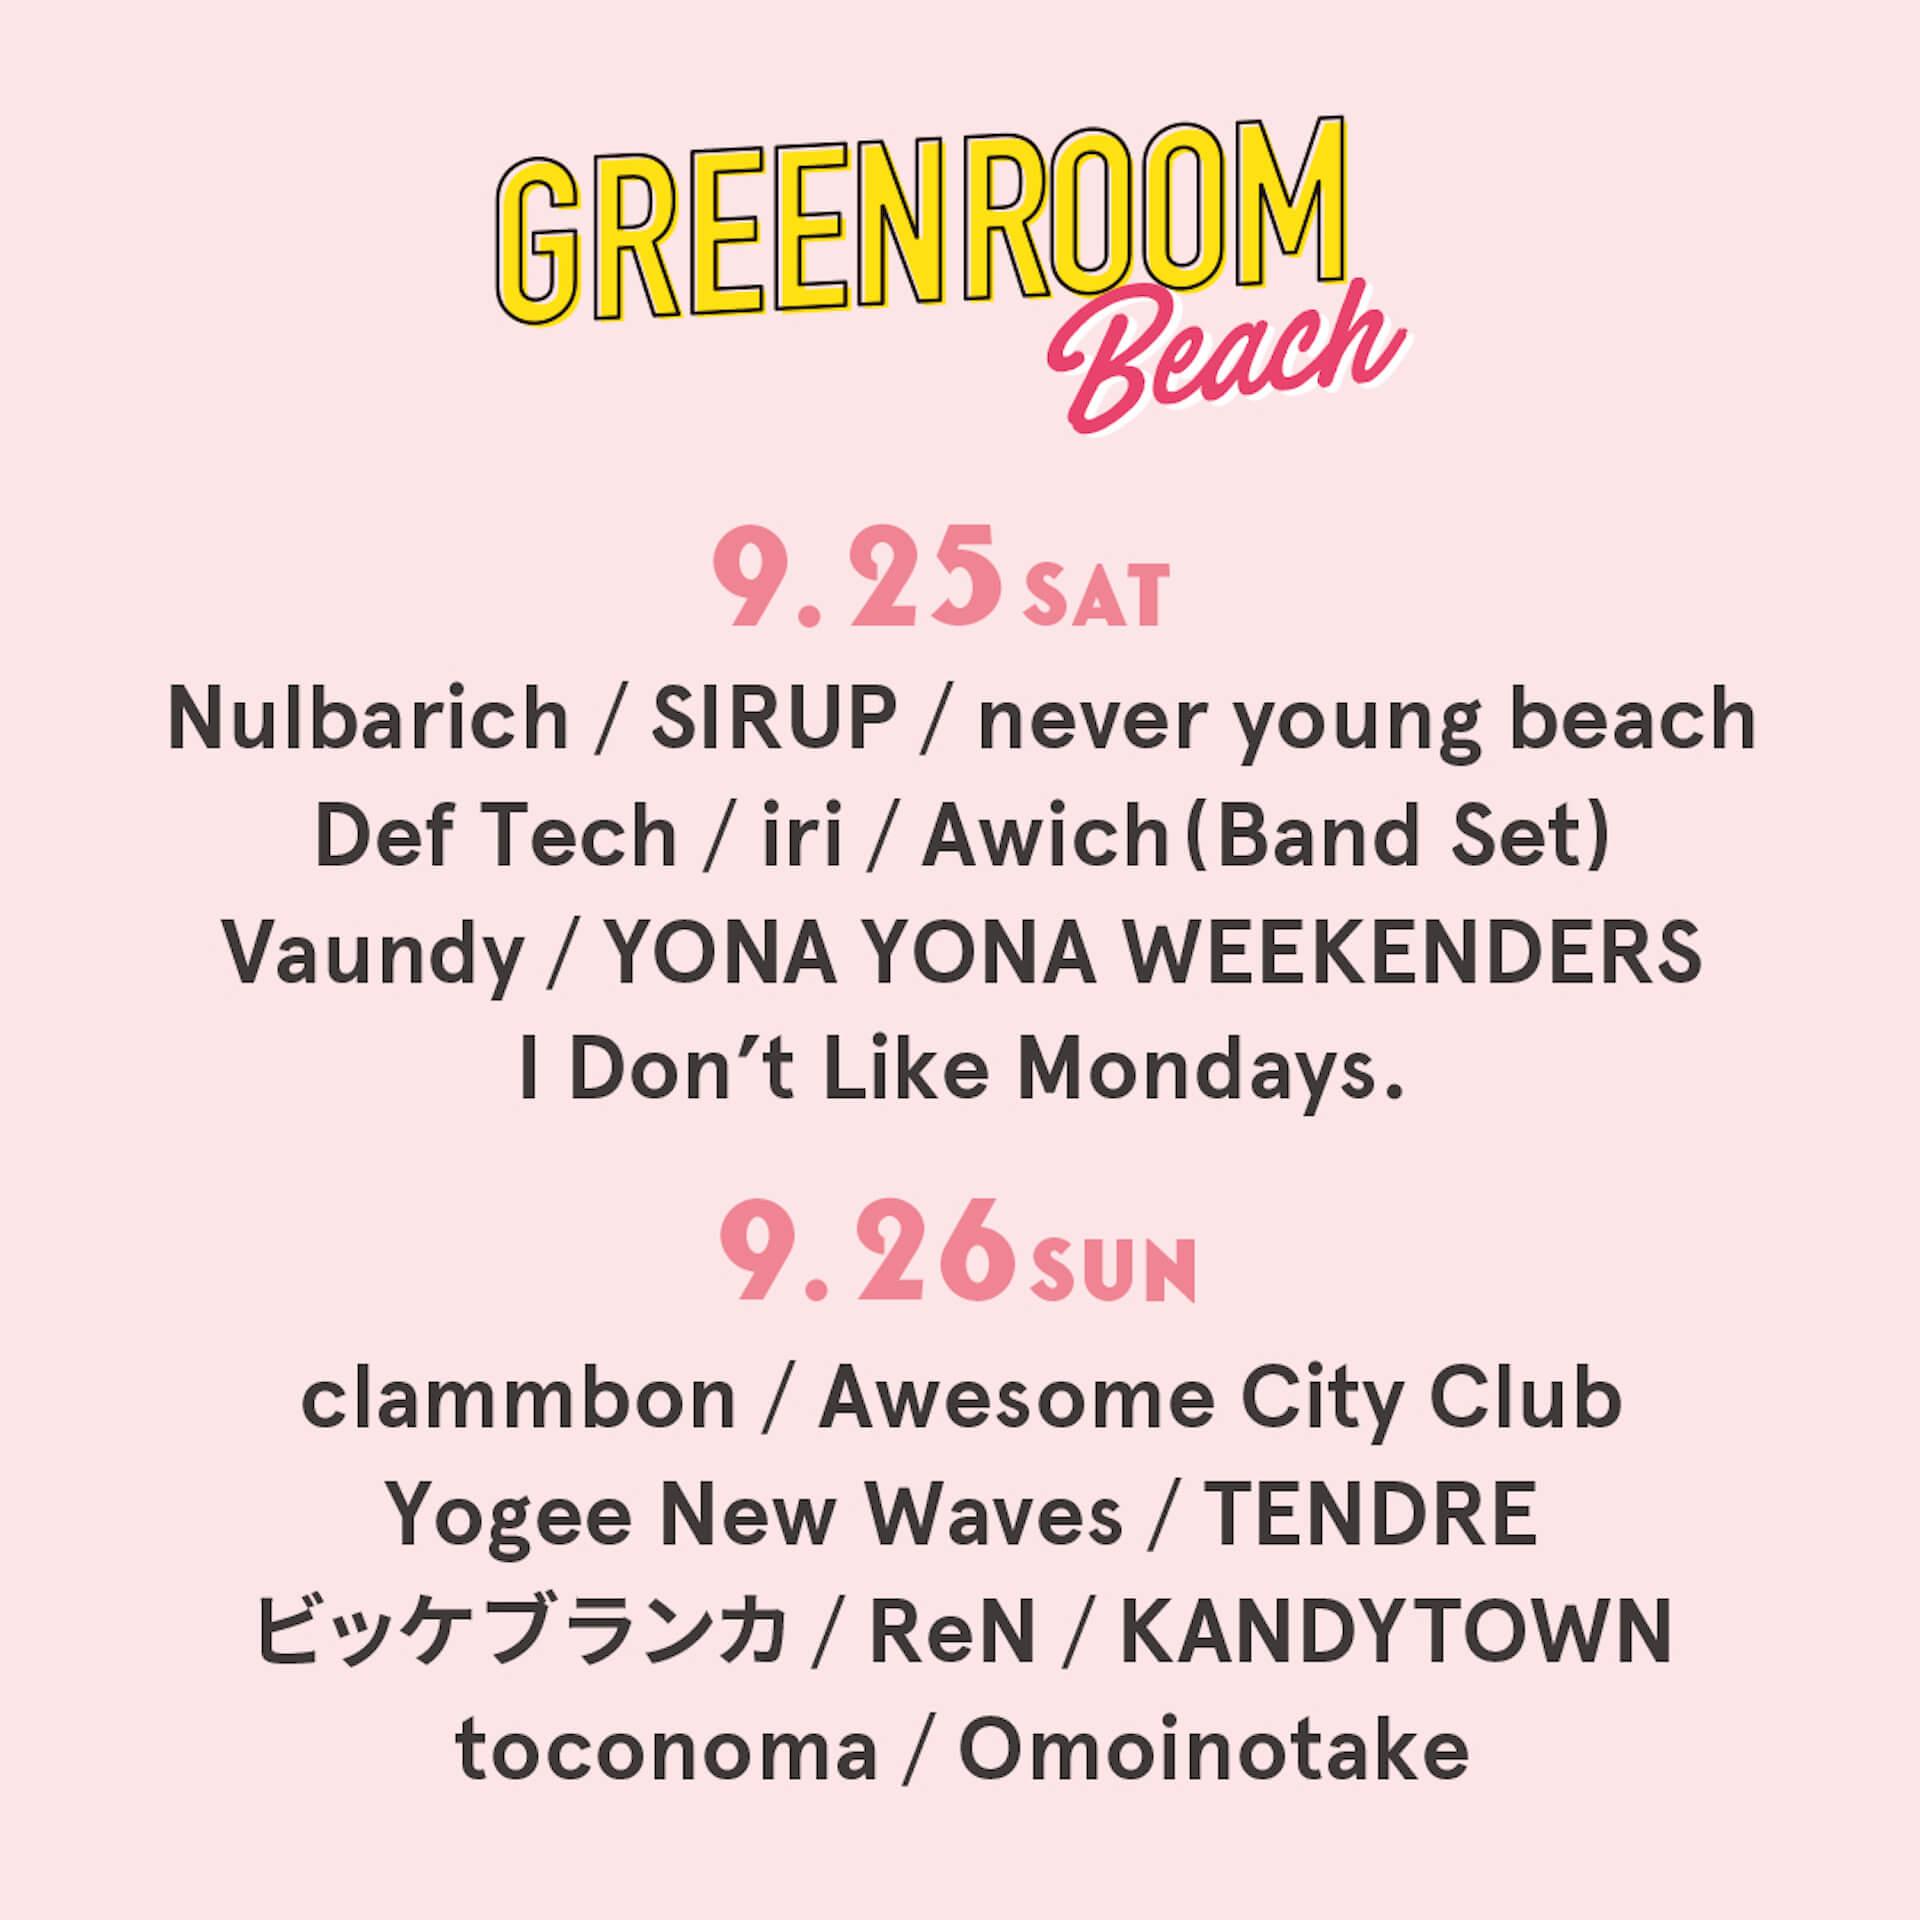 <GREENROOM BEACH>の最終ラインナップがついに解禁!clammbon、ビッケブランカ、ReNの出演が決定 music210806_greenroombeach_1